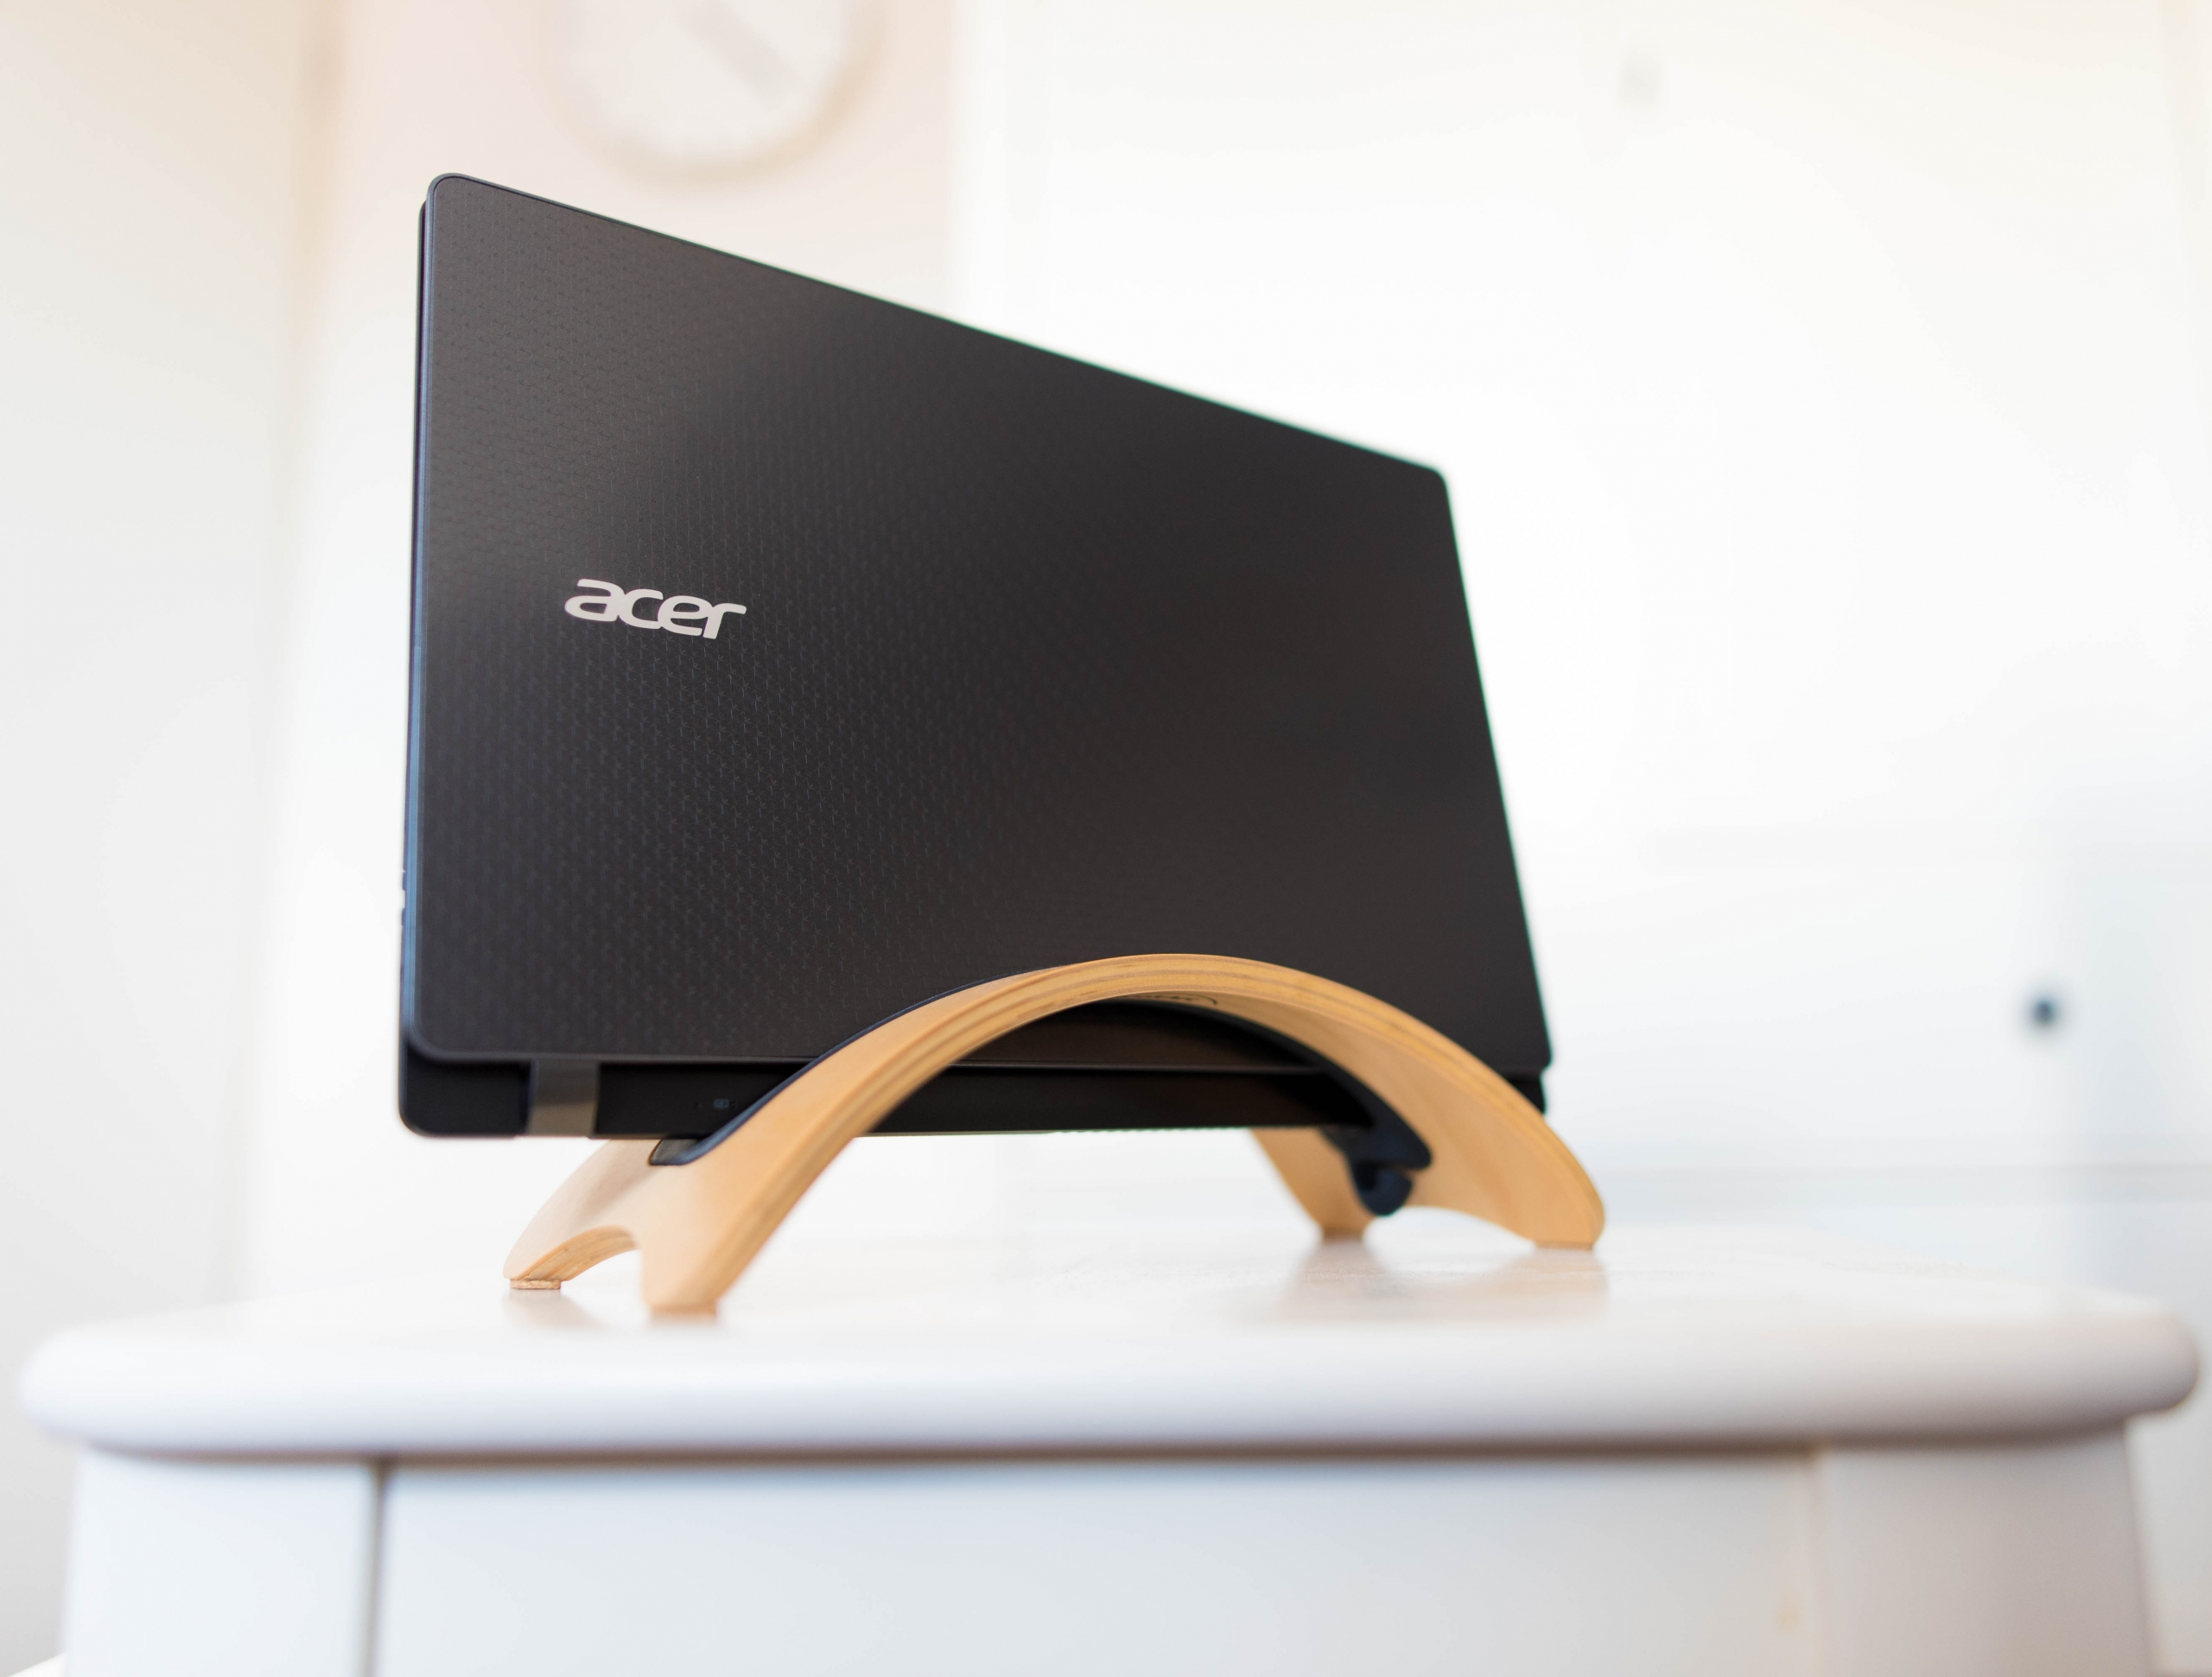 "ACER Laptop TravelMate P259-G2 15,6"" FHD 1920x1080 Intel Core i5-7200U 8GB 1TB 940MX W10"